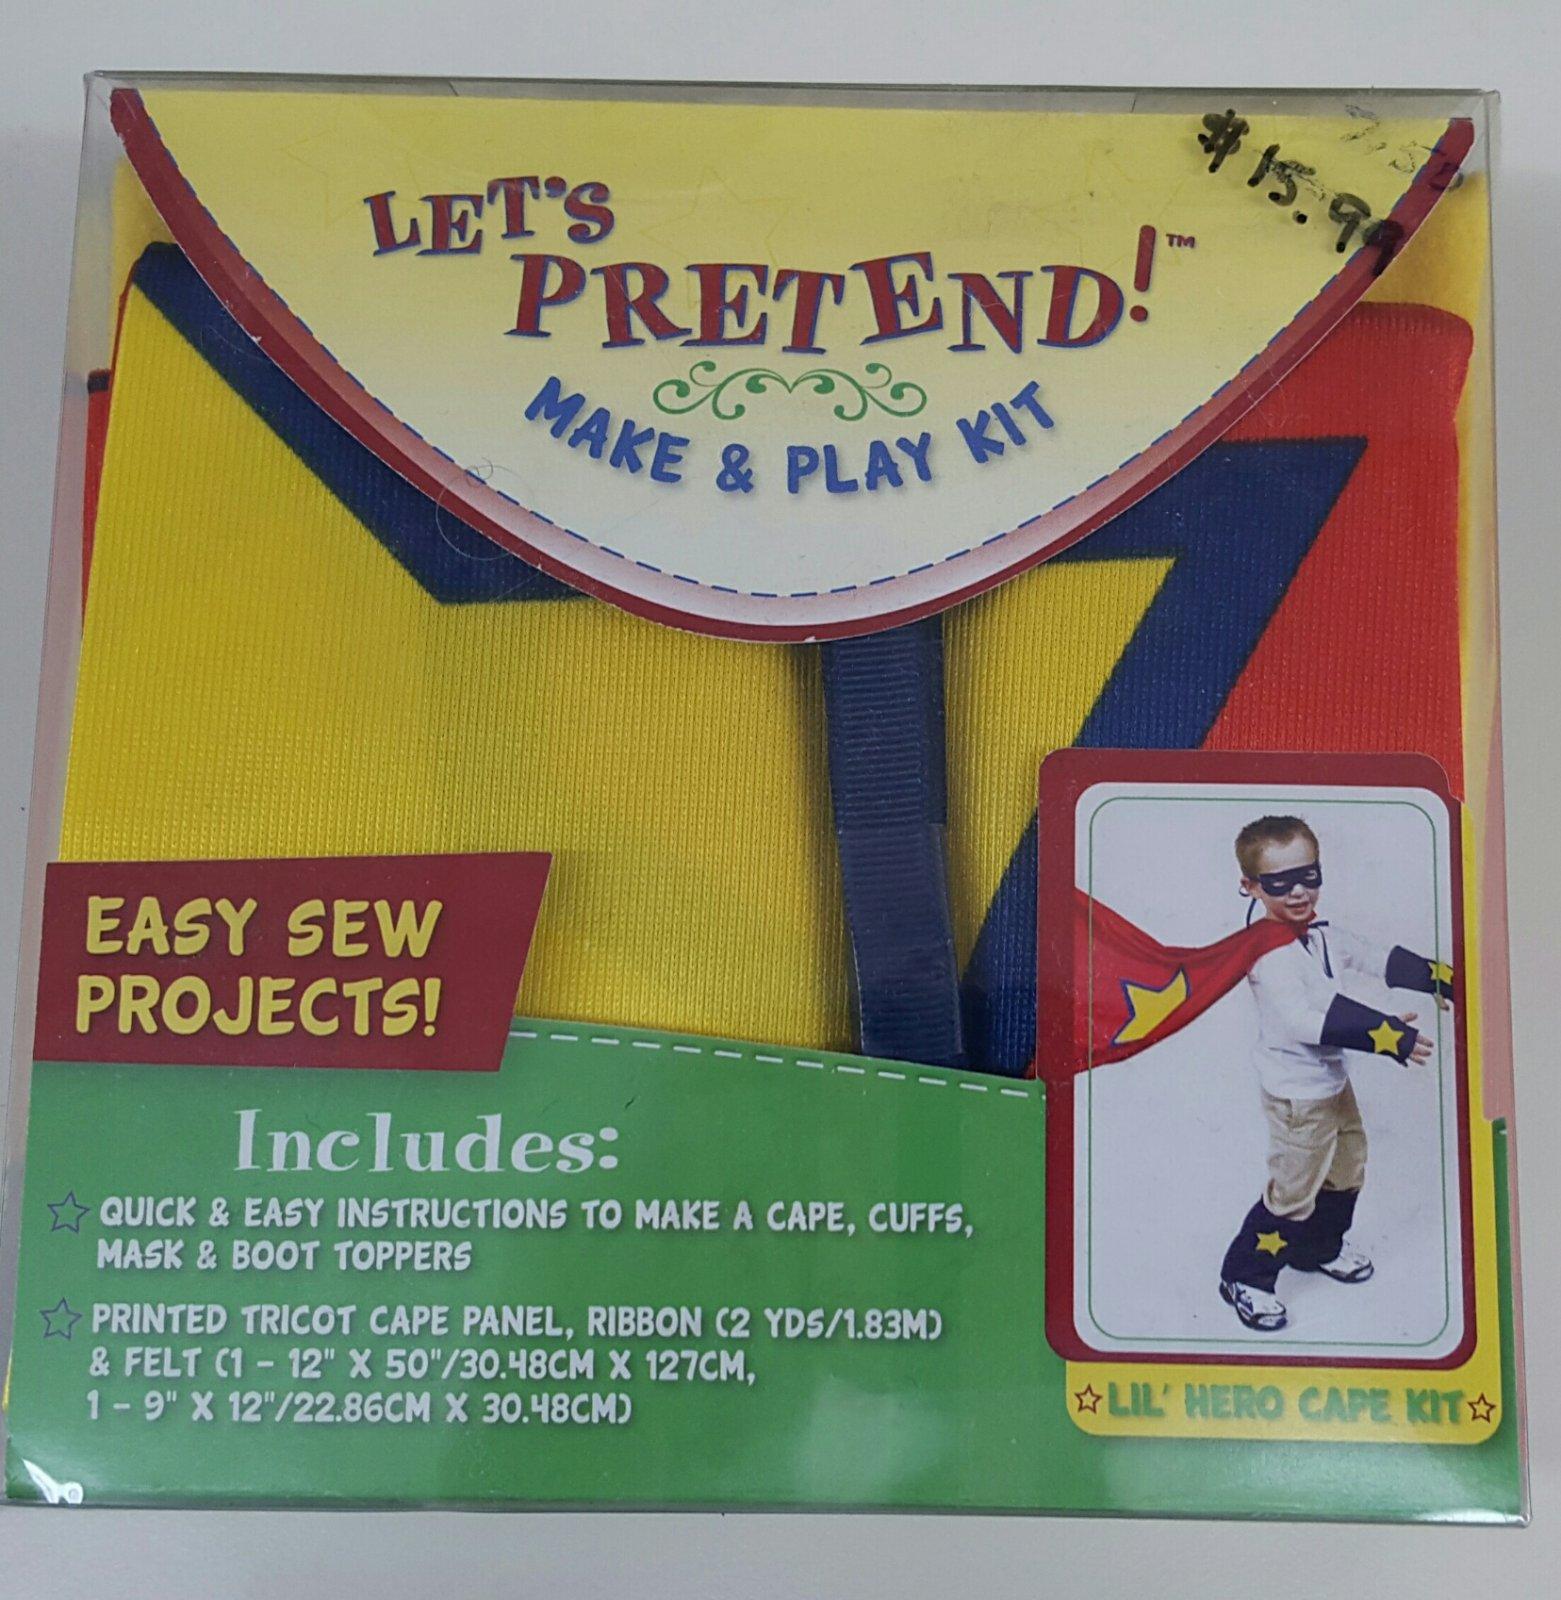 Lil' Hero Cape Kit